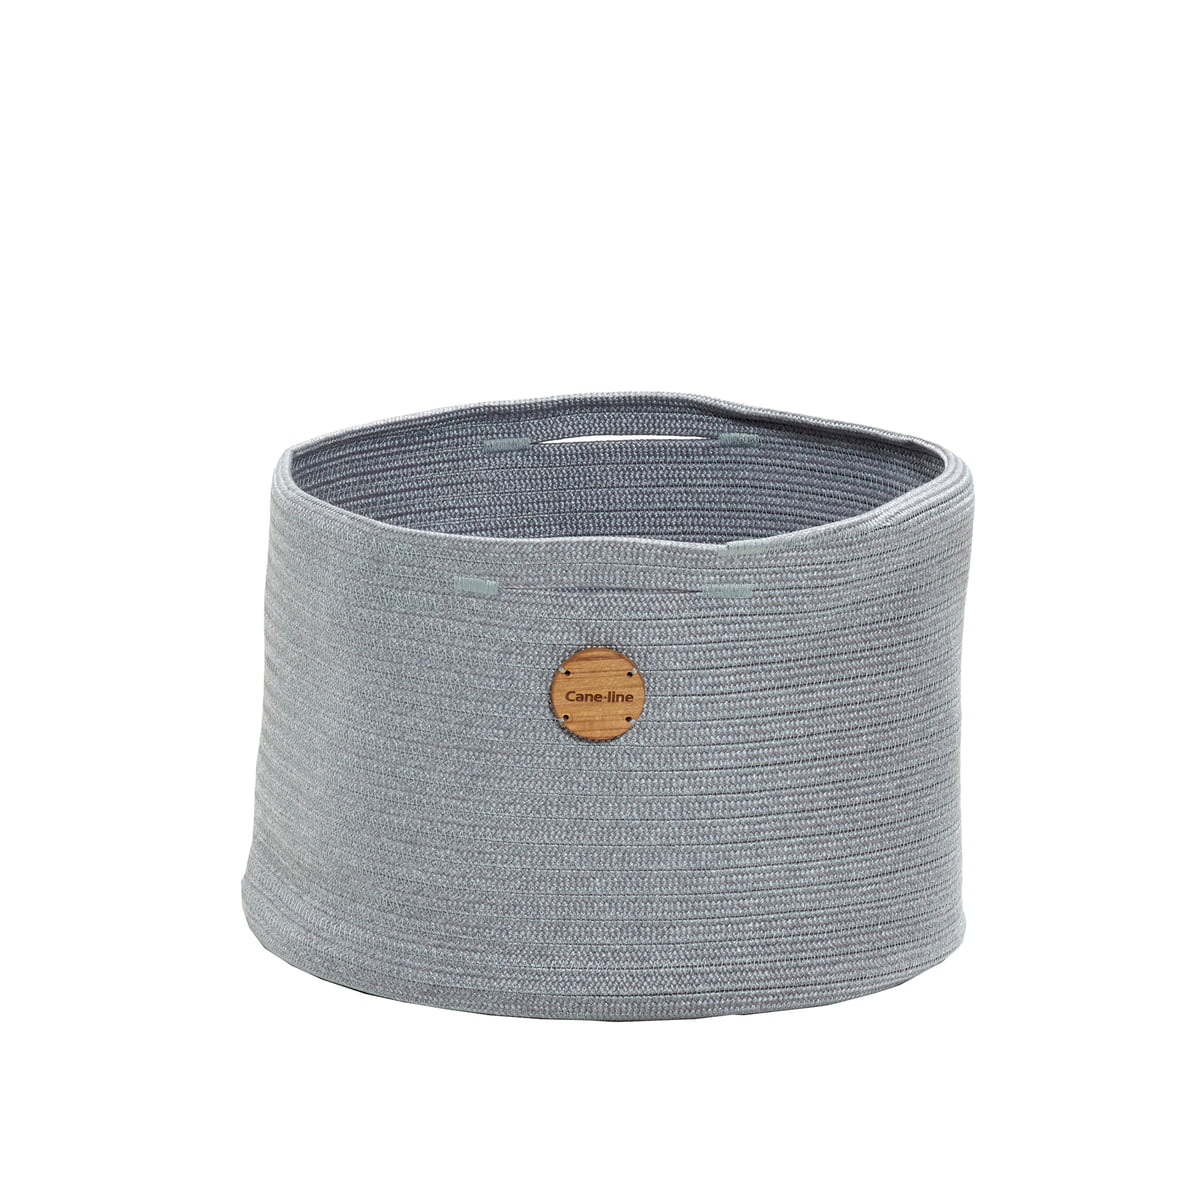 Cane-line - Soft Aufbewahrungskorb Ø 40 cm, hellgrau